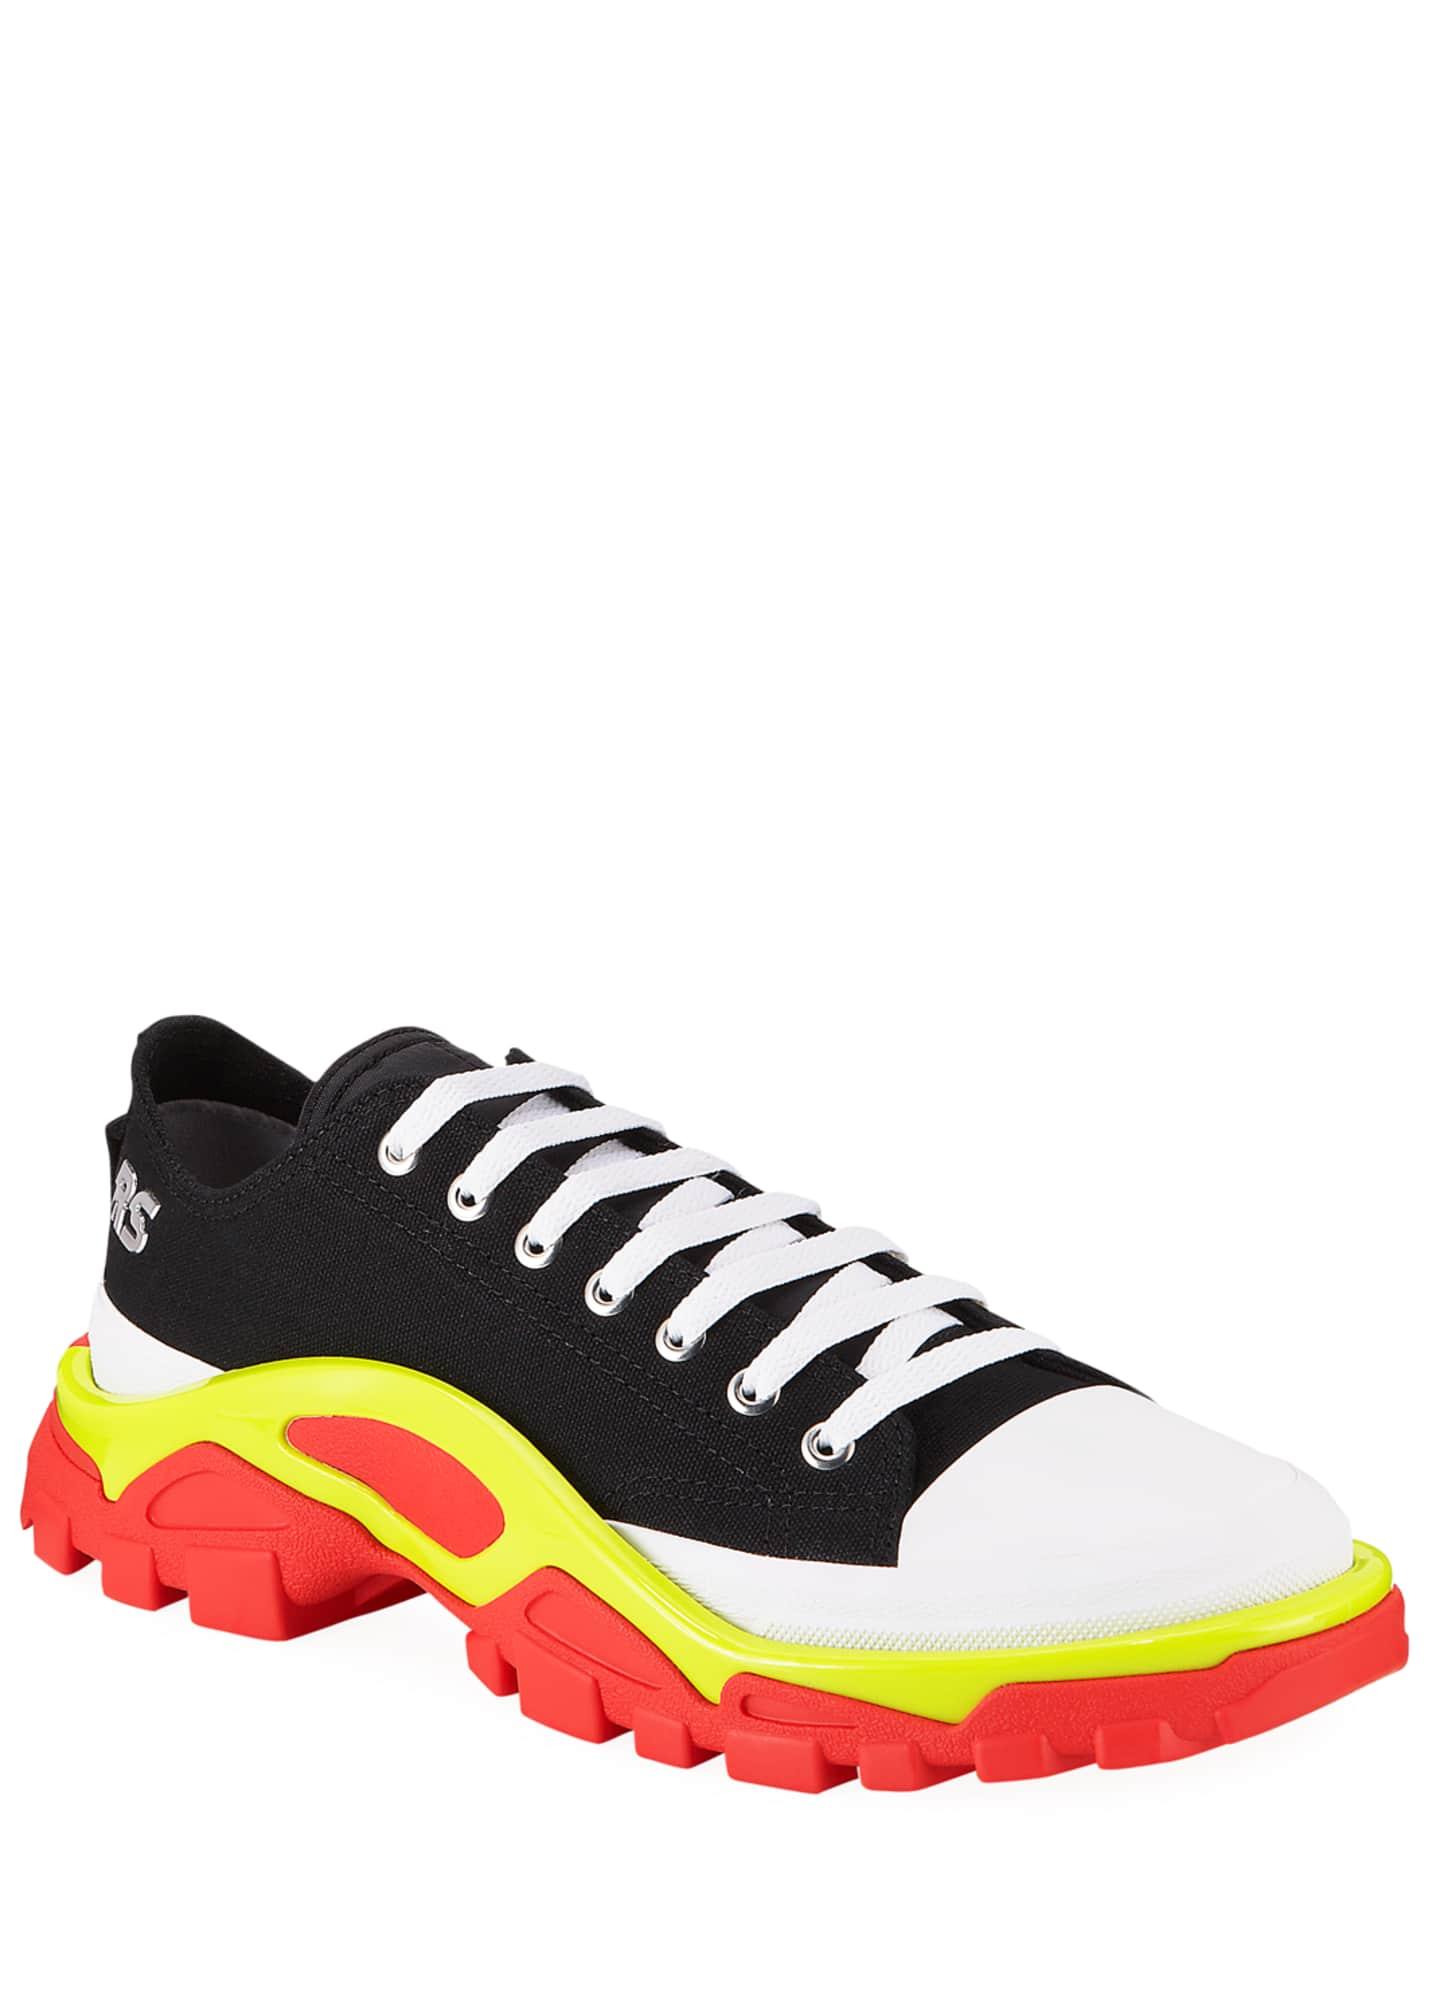 adidas by Raf Simons Men's Detroit Runner Canvas